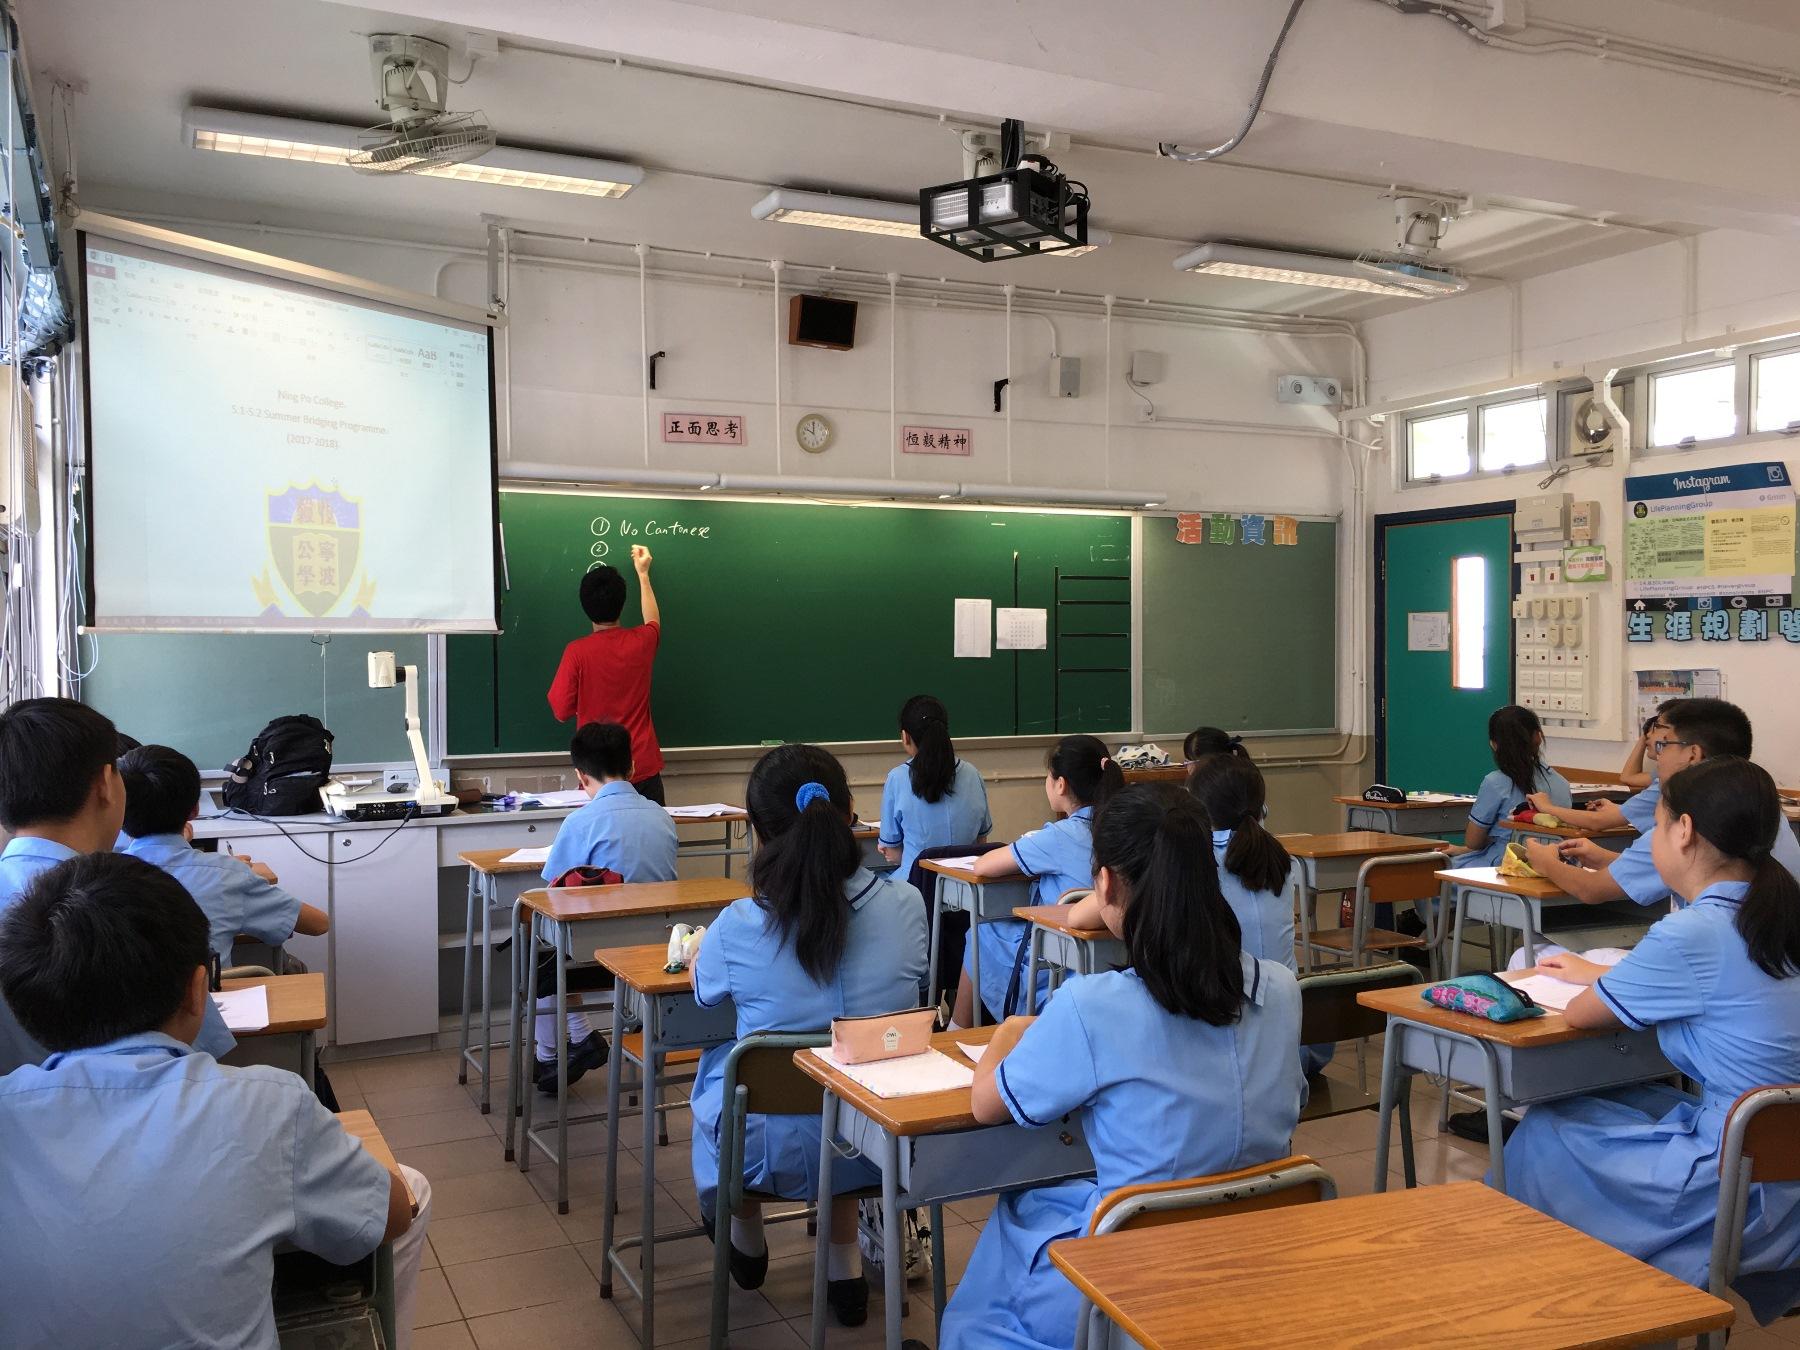 http://www.npc.edu.hk/sites/default/files/img_1013.jpg